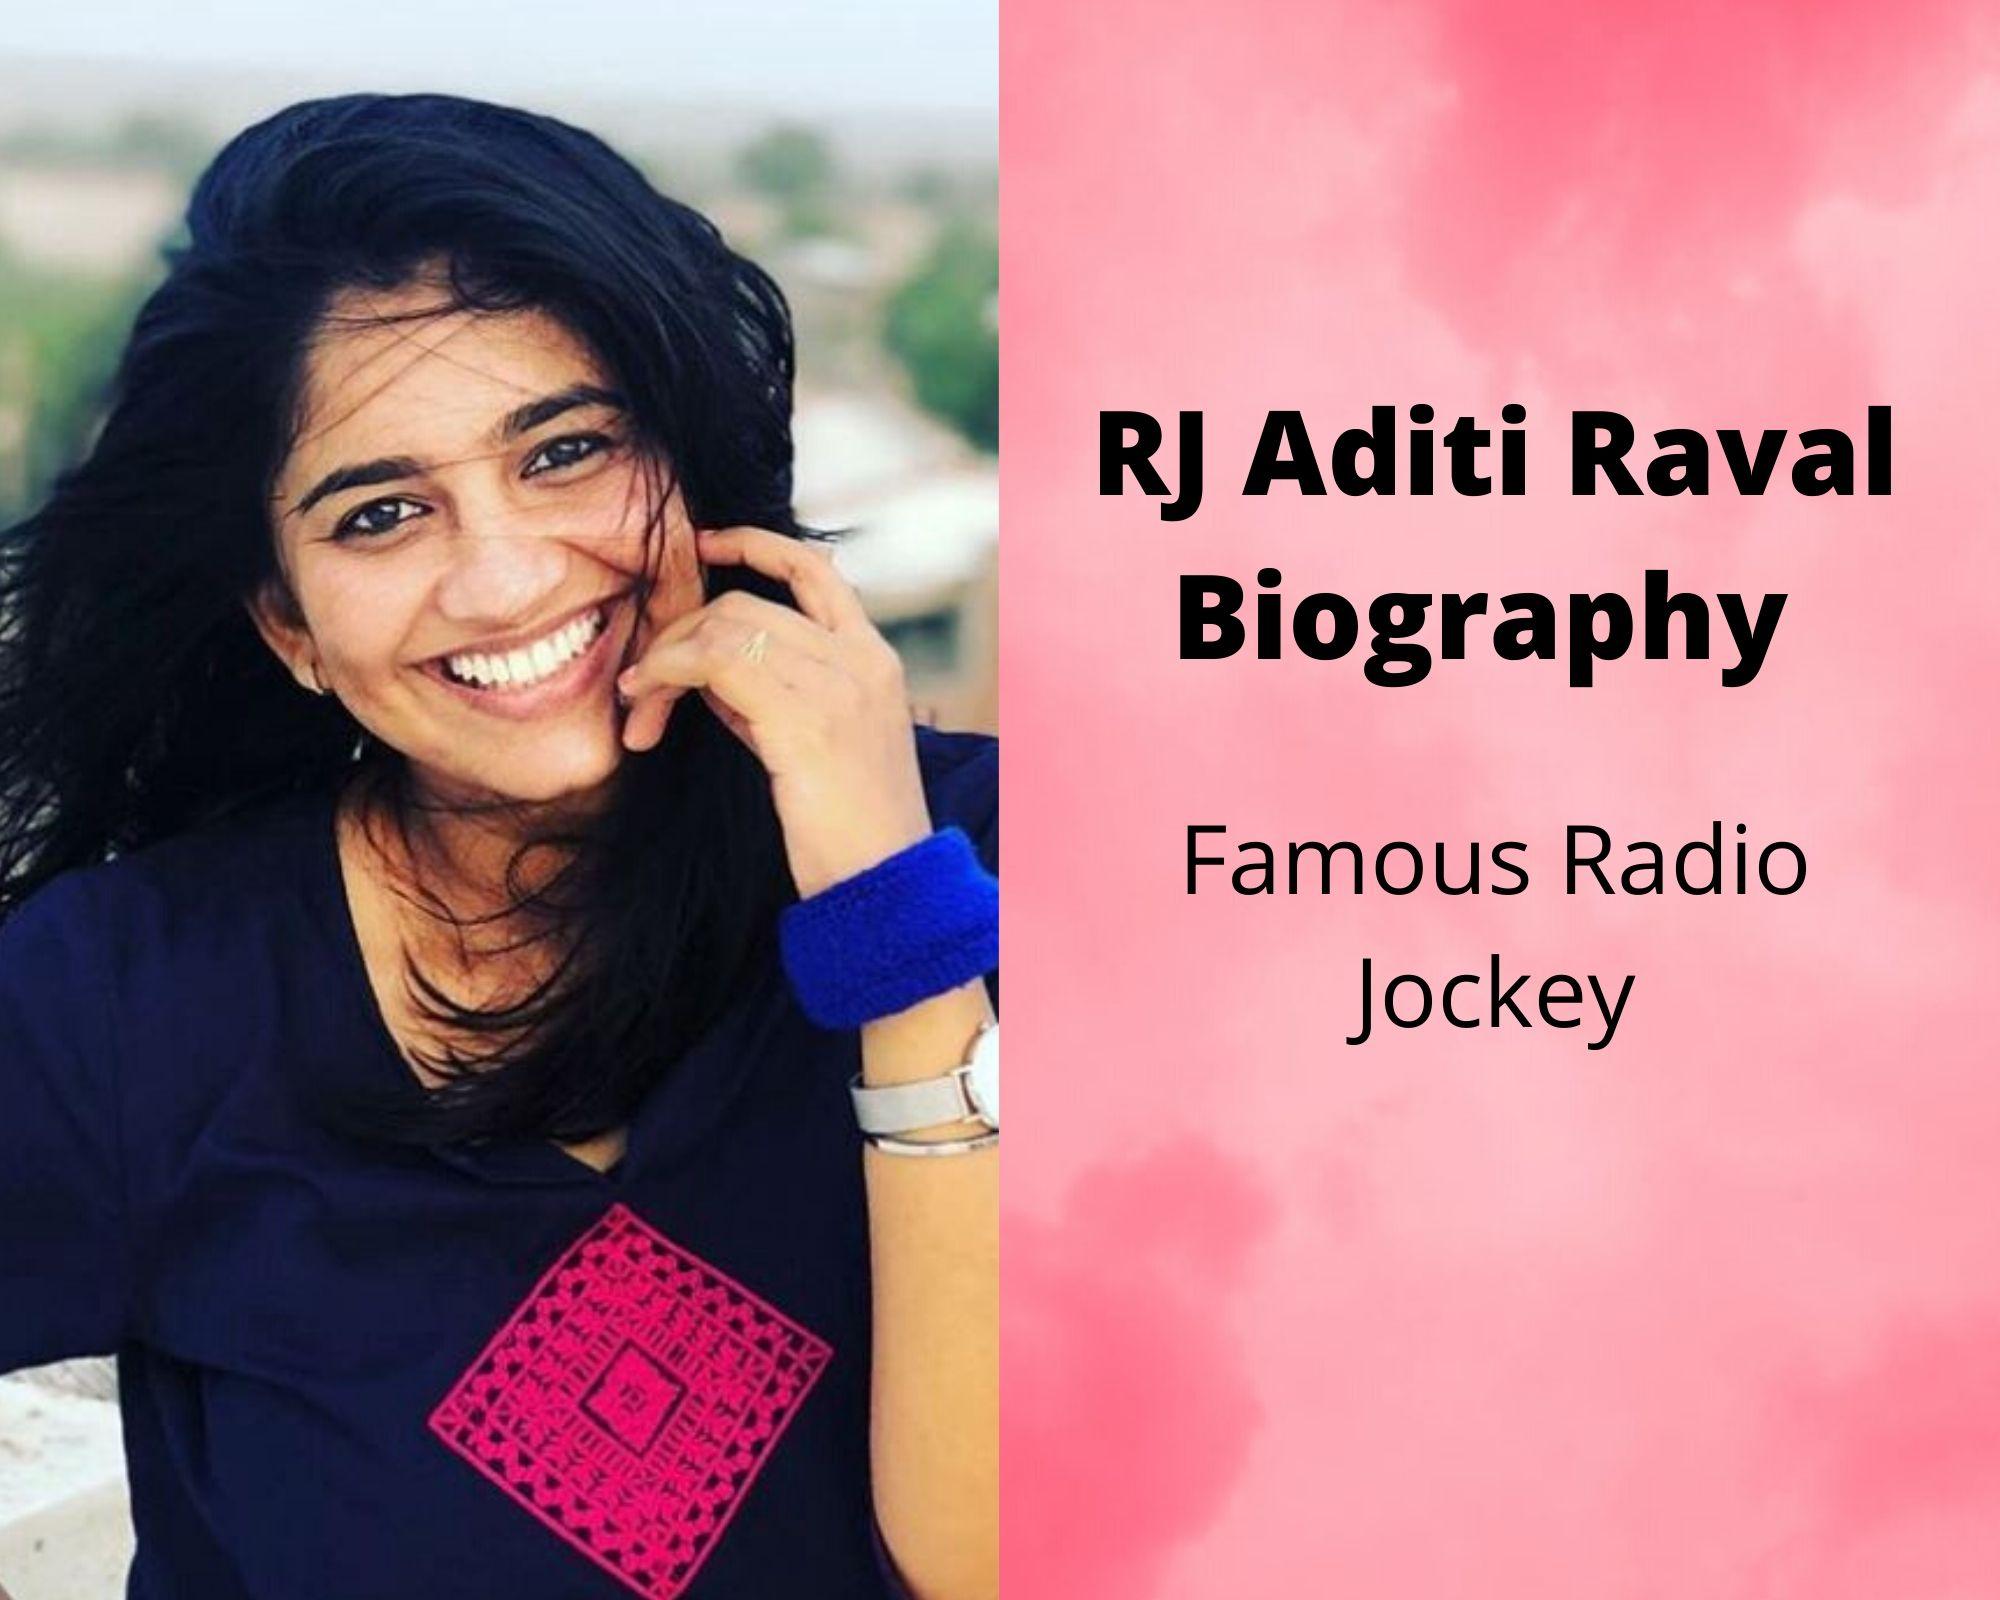 RJ Aditi Raval Biography | Wiki | Age | Family | Net worth | Boyfriend